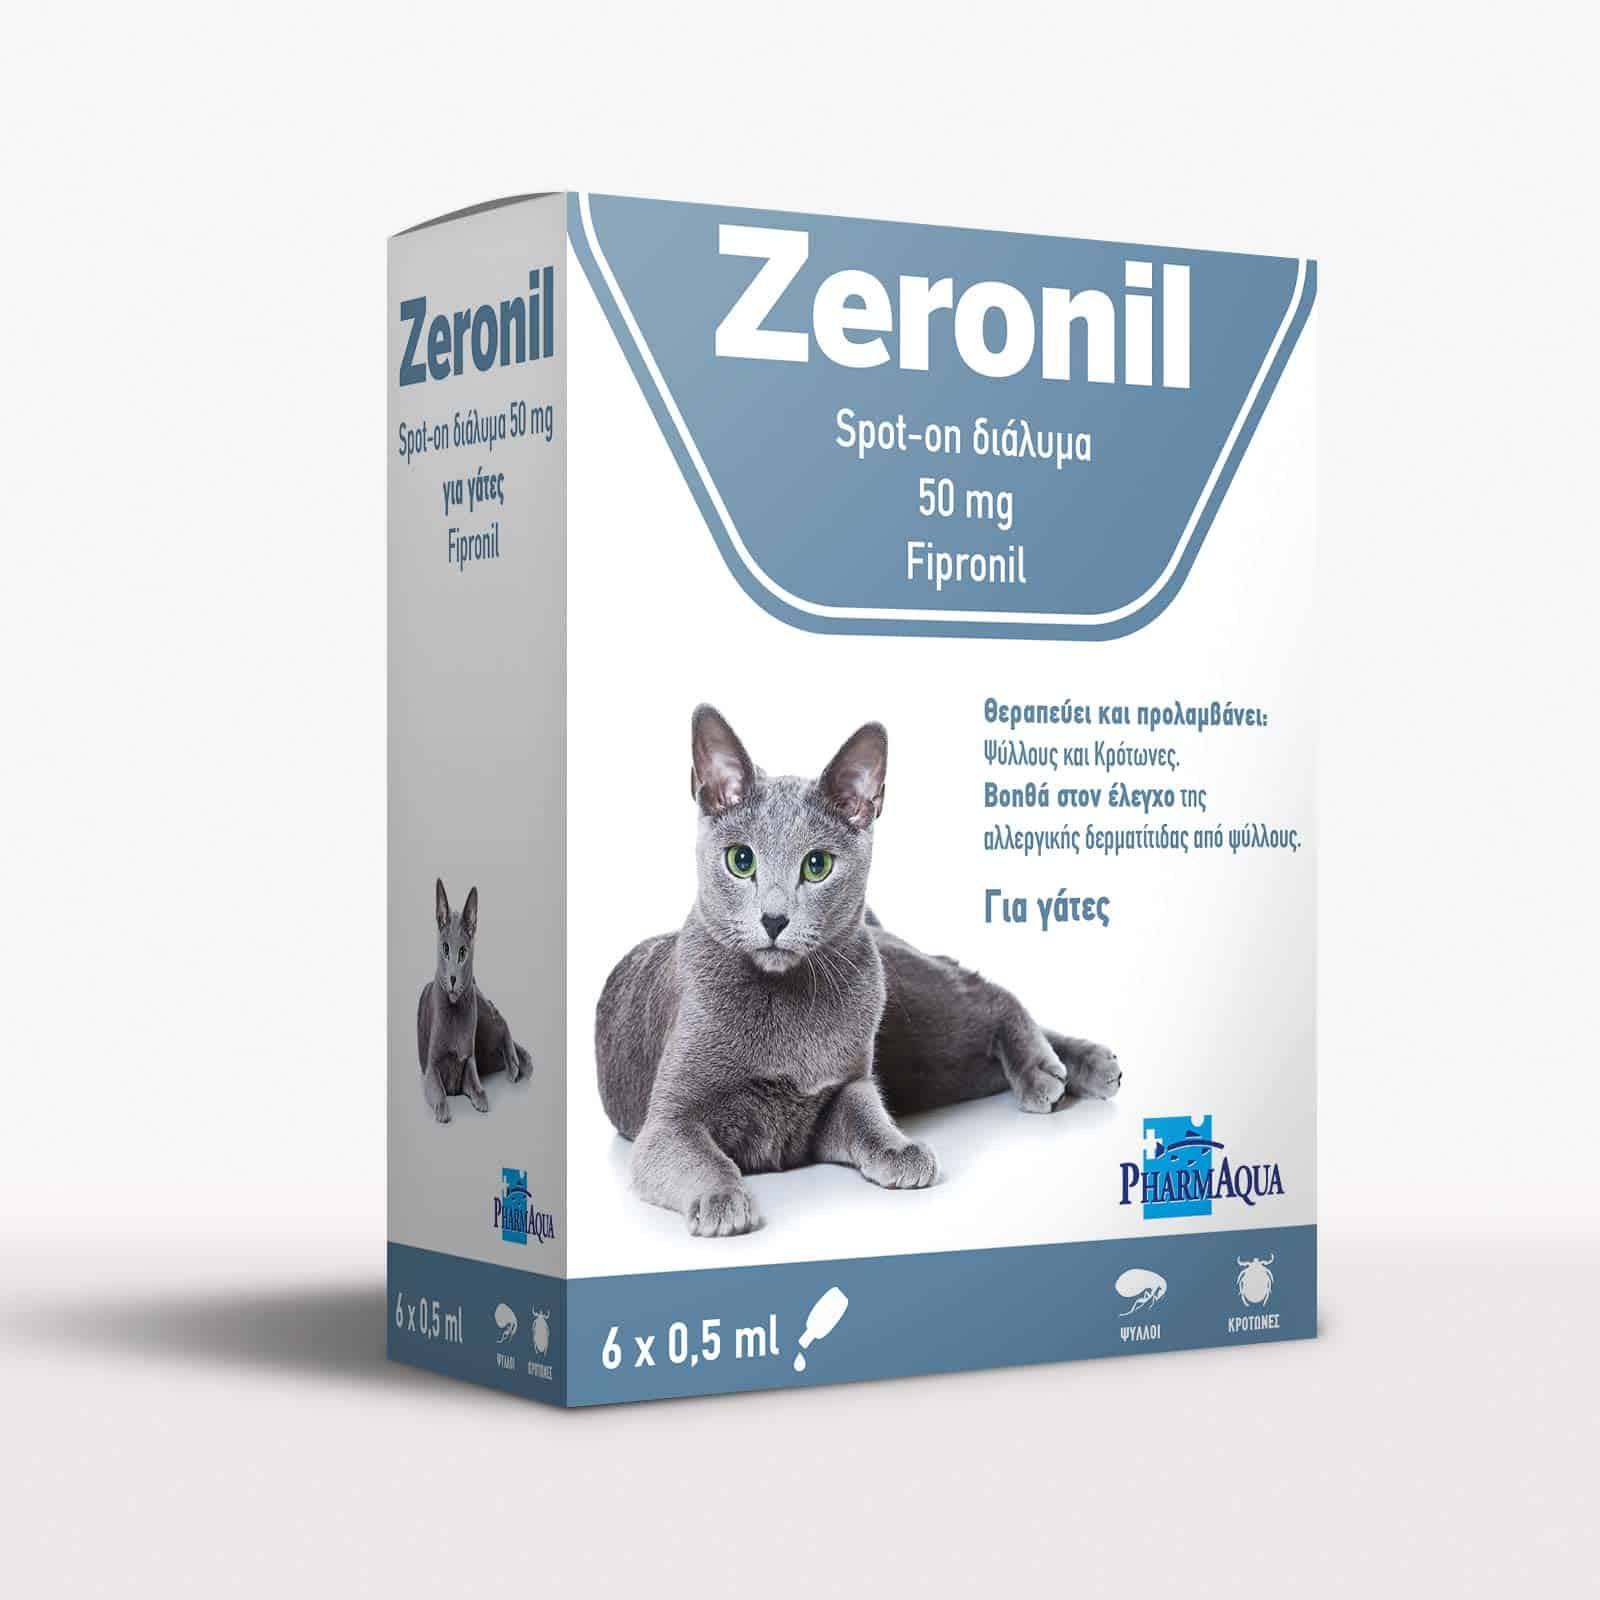 PROPAGANDA - zeronil blue